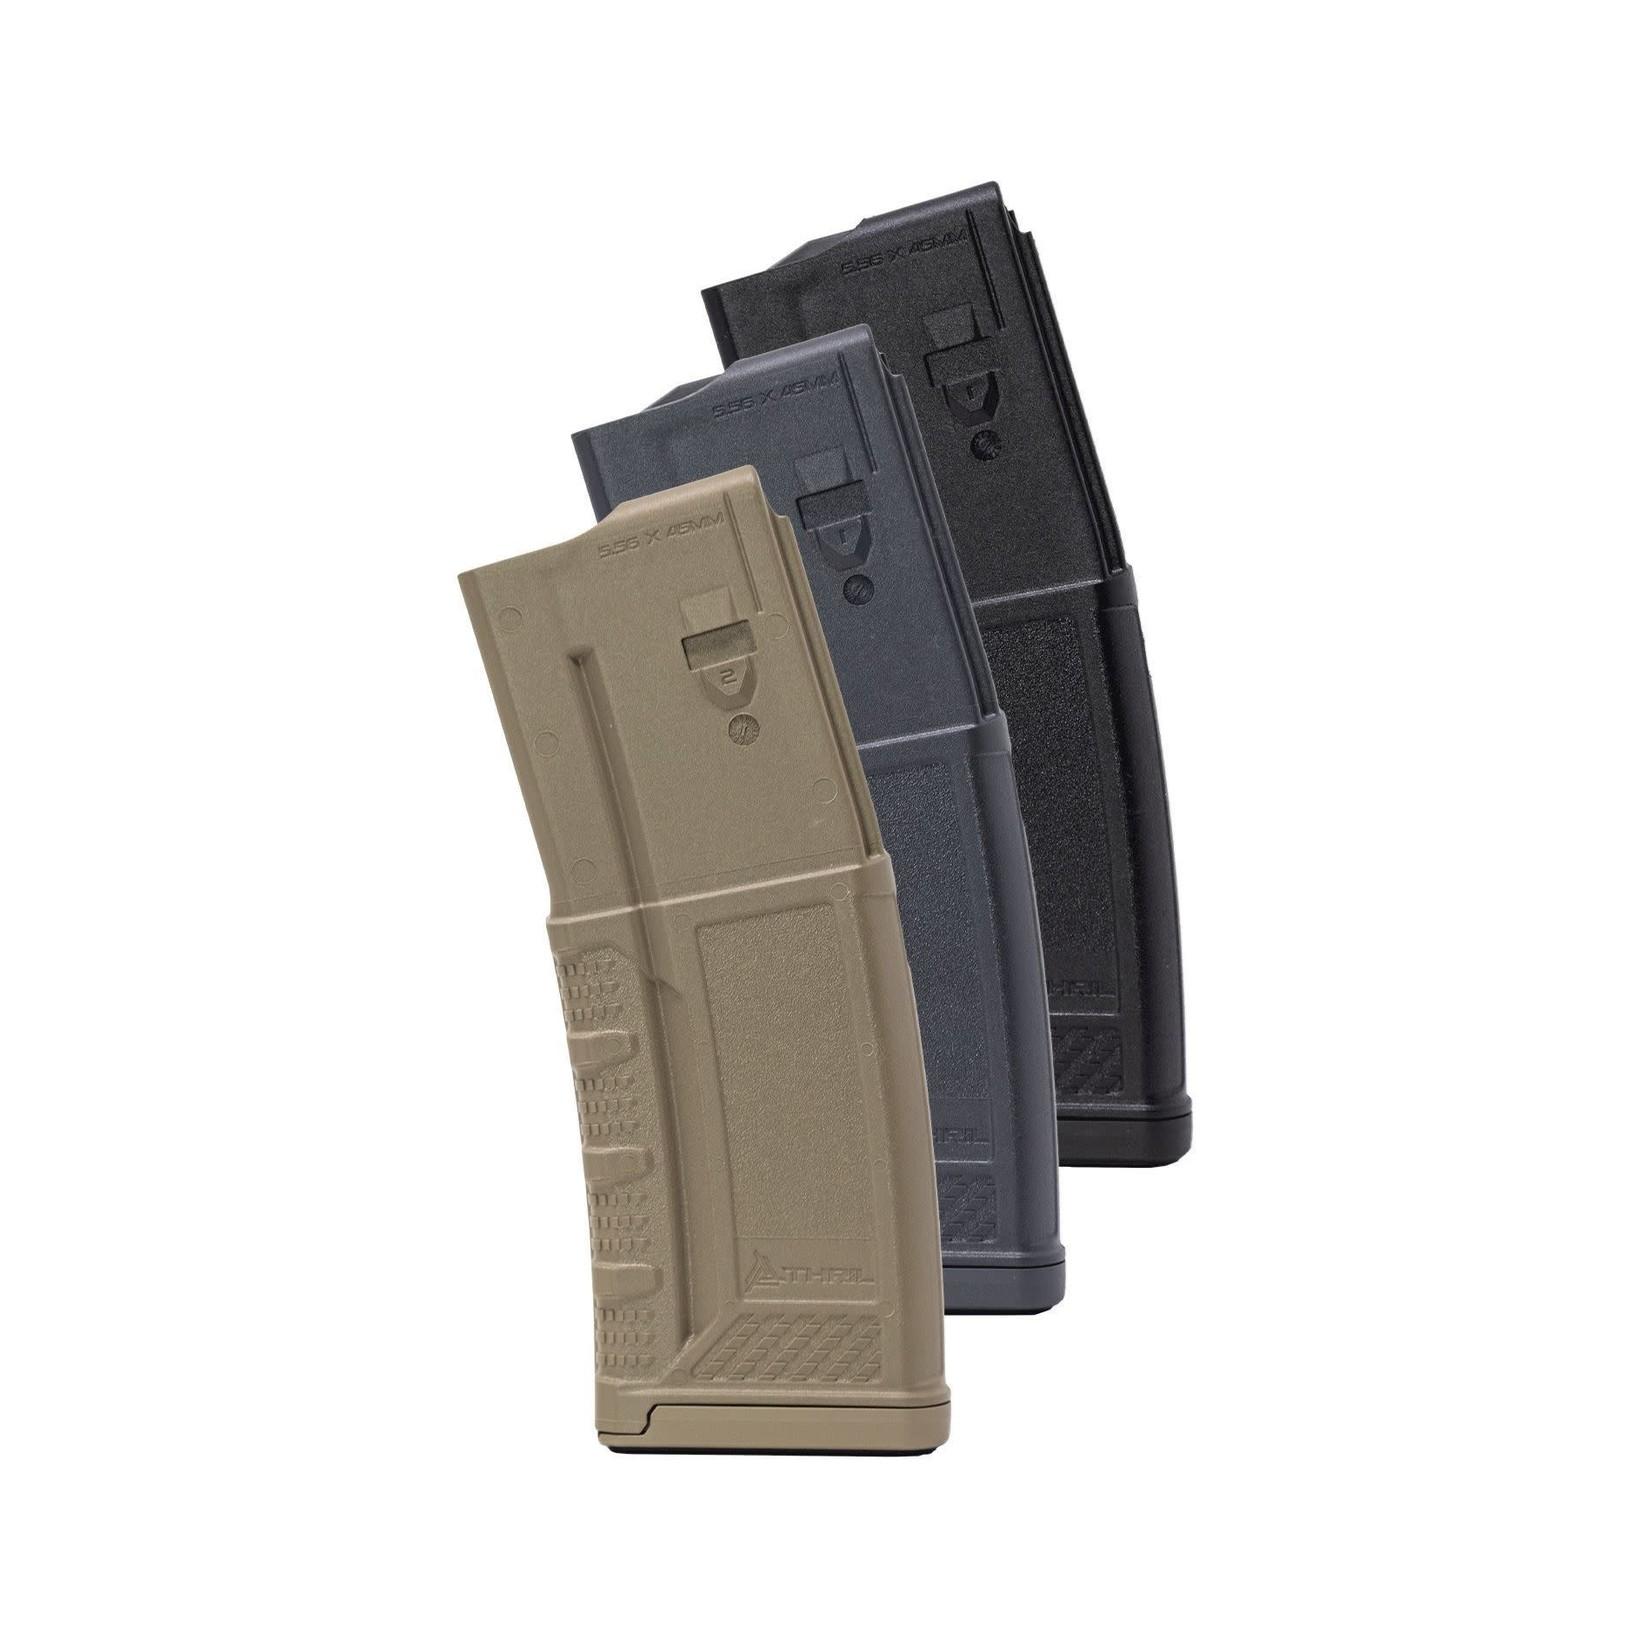 PMX THRiL USA 5.56x45mm Black Polymer 30 Round Magazine